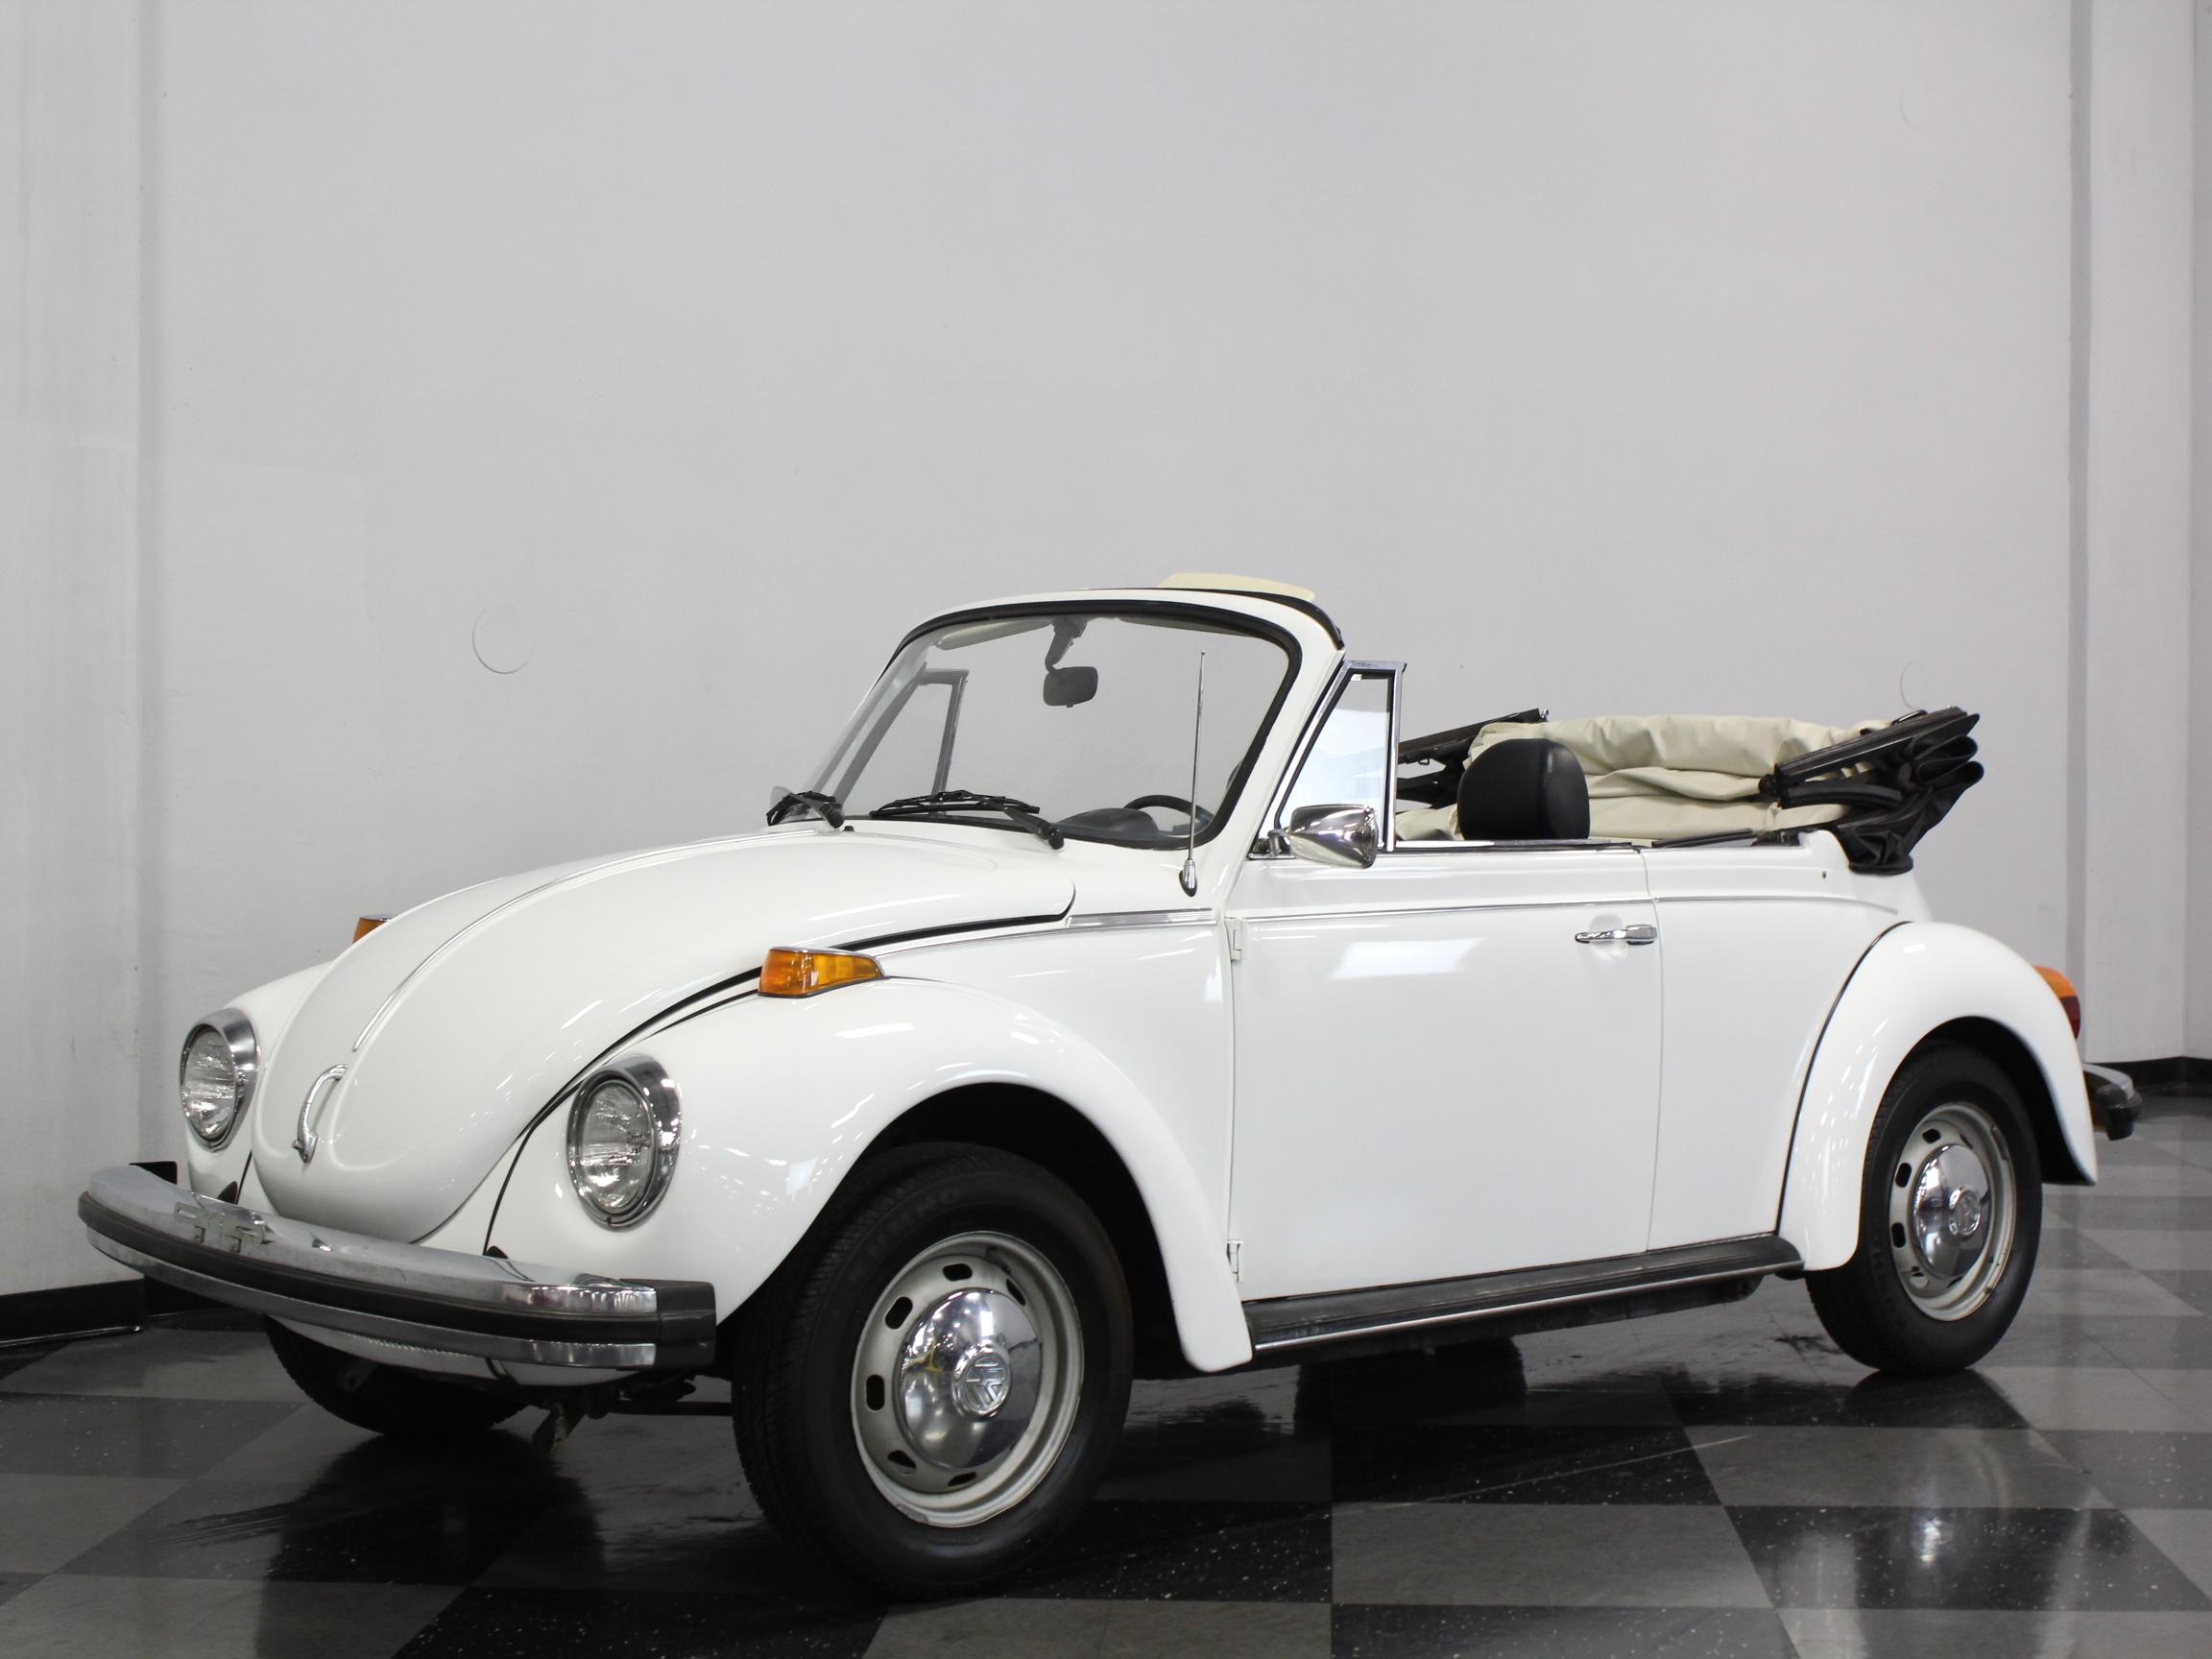 1978 Volkswagen Super Beetle Streetside Classics The